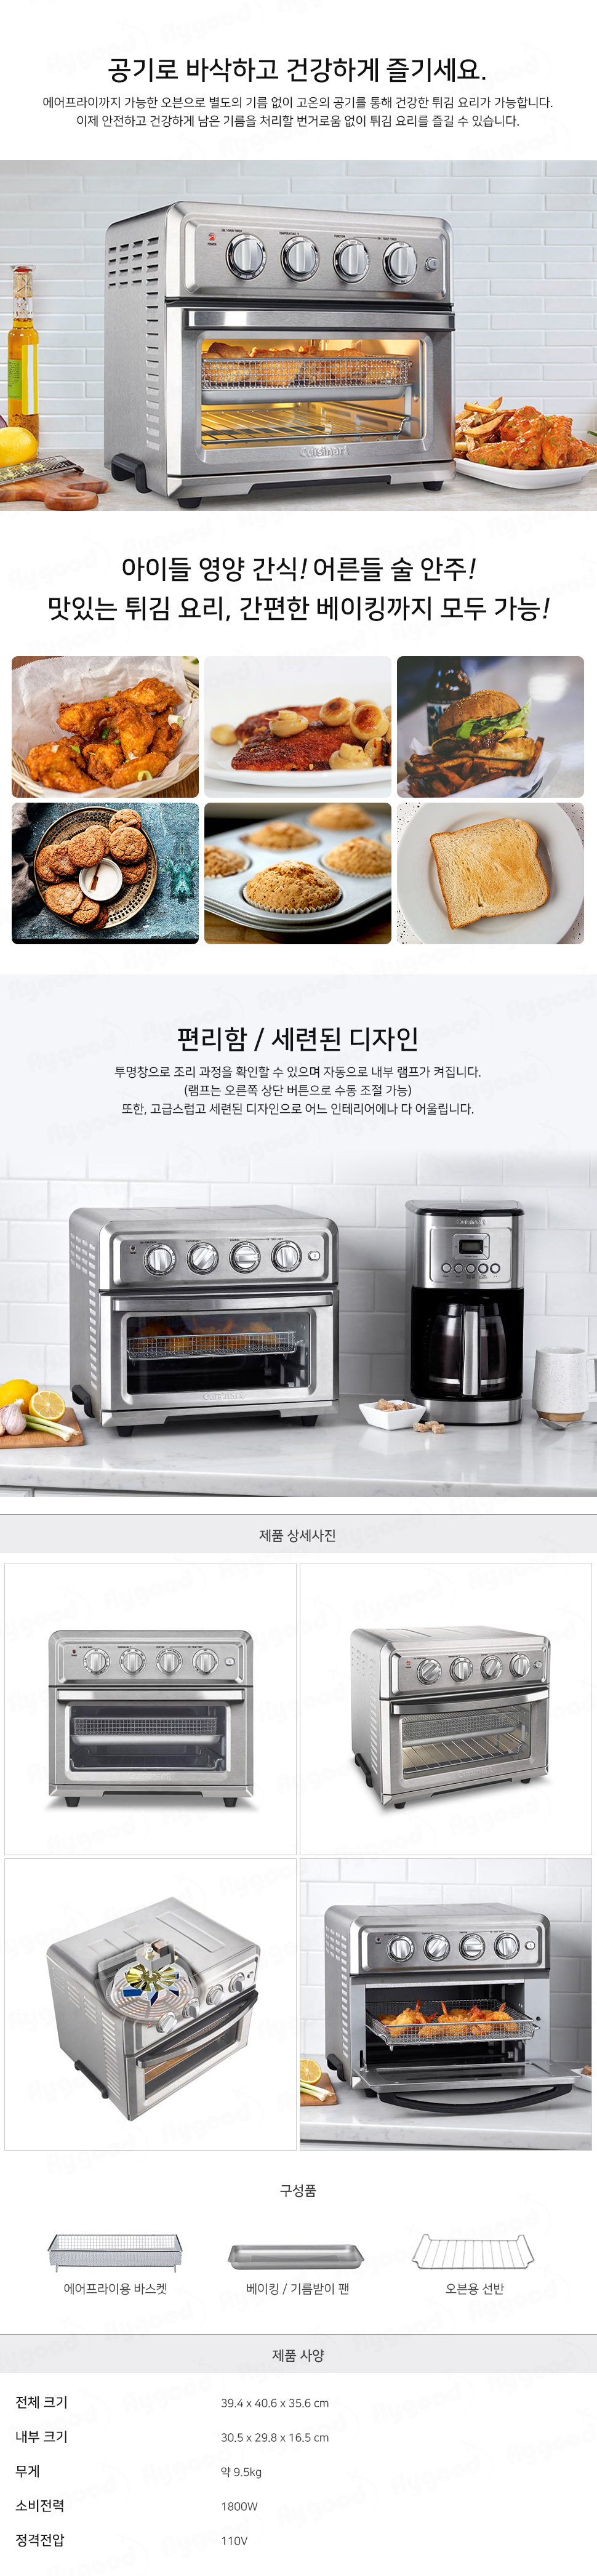 Cuisinart_air_fryer_toaster_oven_TOA-60_02.jpg